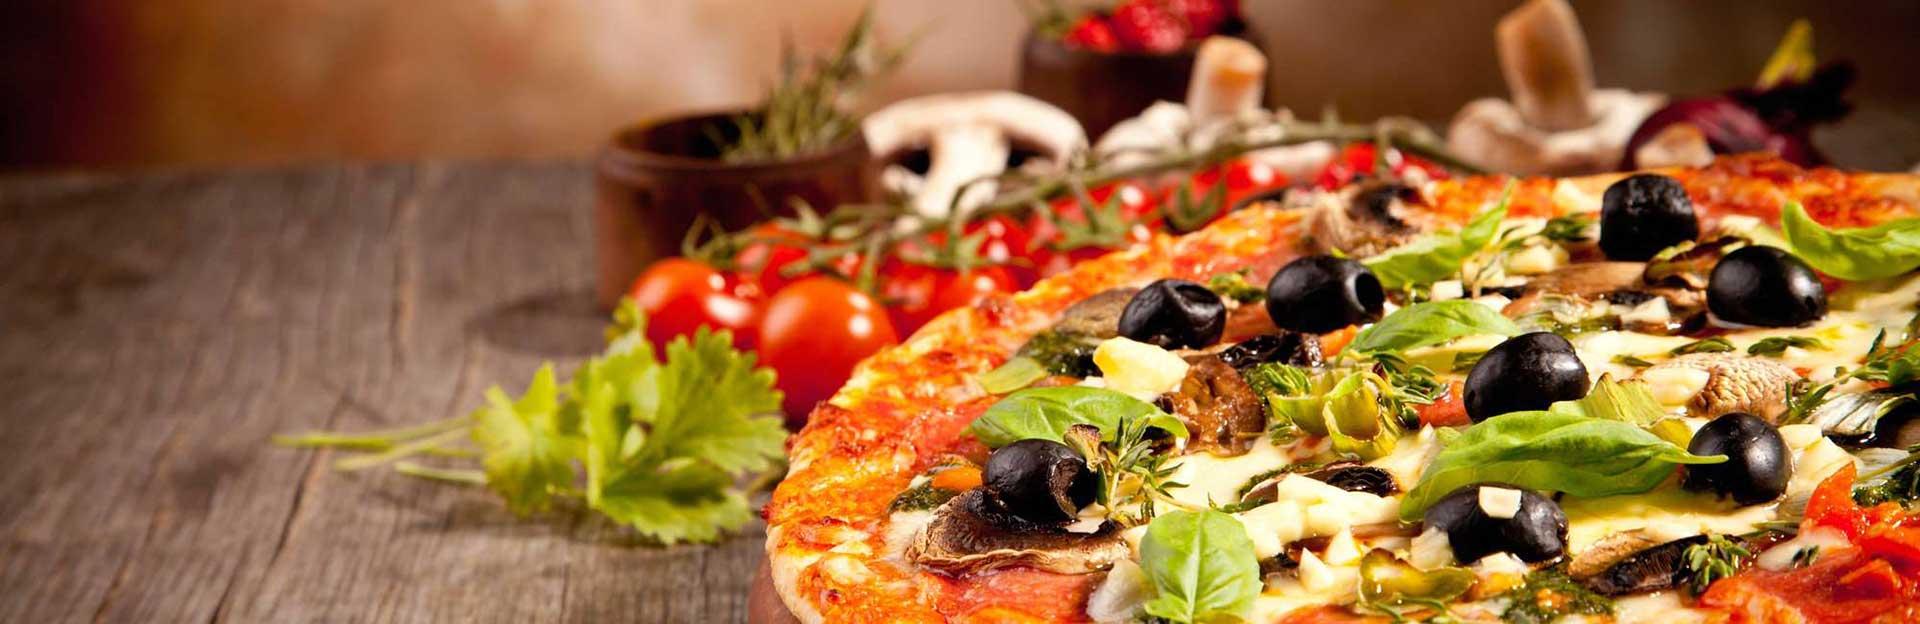 Slide Dining Pizza 1920x624